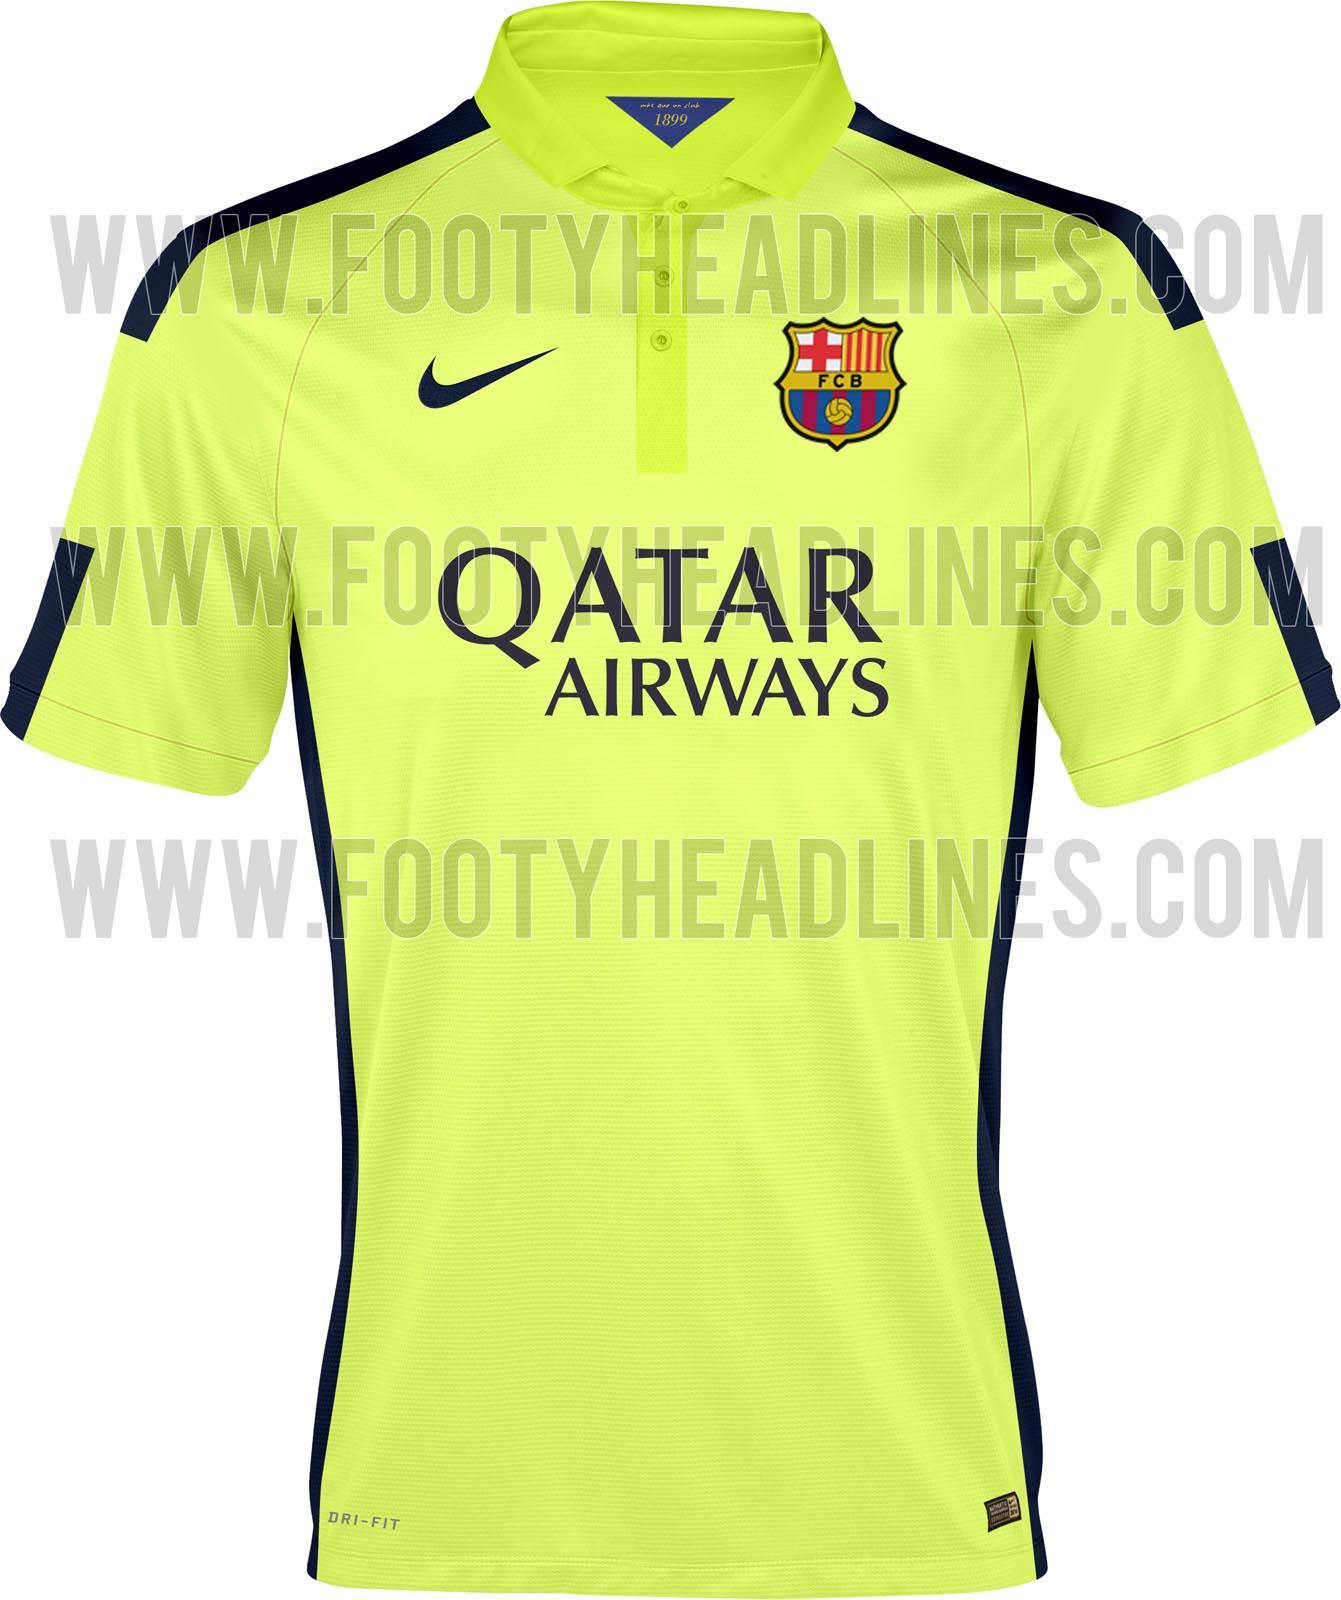 http://1.bp.blogspot.com/-bXyMmmZmsAg/U9kSNKFW8wI/AAAAAAAAY4E/QMPUAHMdQQo/s1600/Barcelona-14-15-Third-Kit.jpg